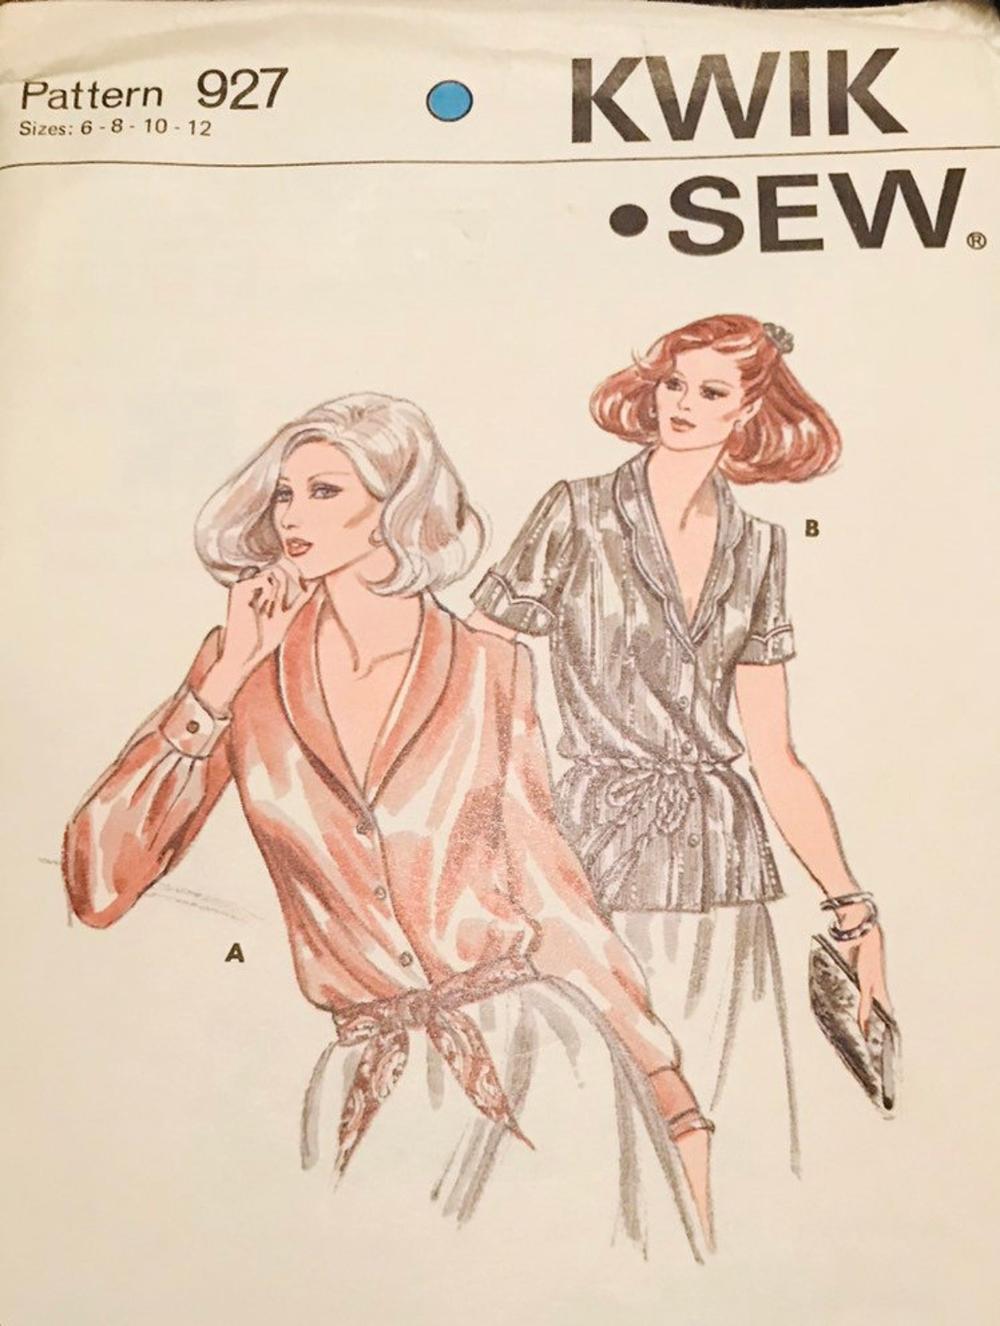 80's Kwik Sew Sewing Pattern 927 Shawl Blouse Misses Size 6 8 10 12 Uncut